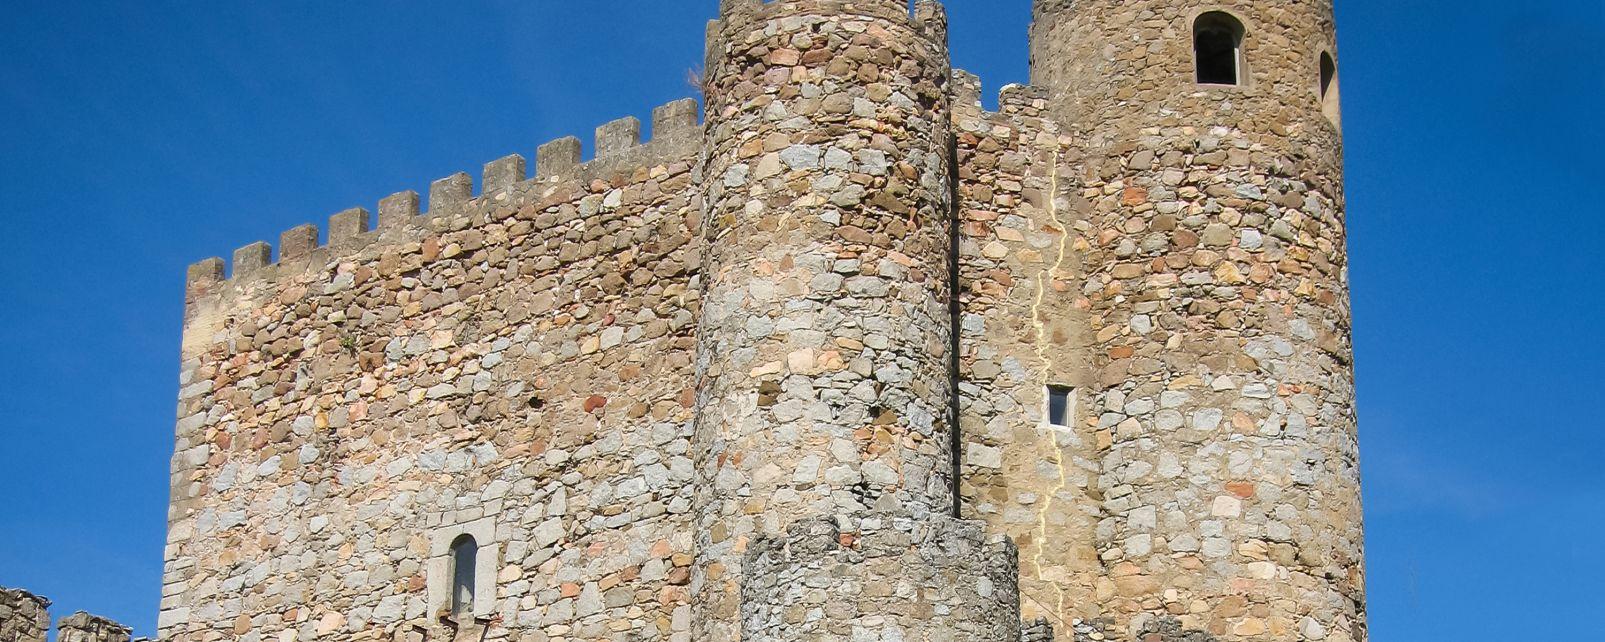 Die Burg Castillo de la Coracera, Die Monumente, San Martín de Valdeiglesias, Gemeinschaft Madrid